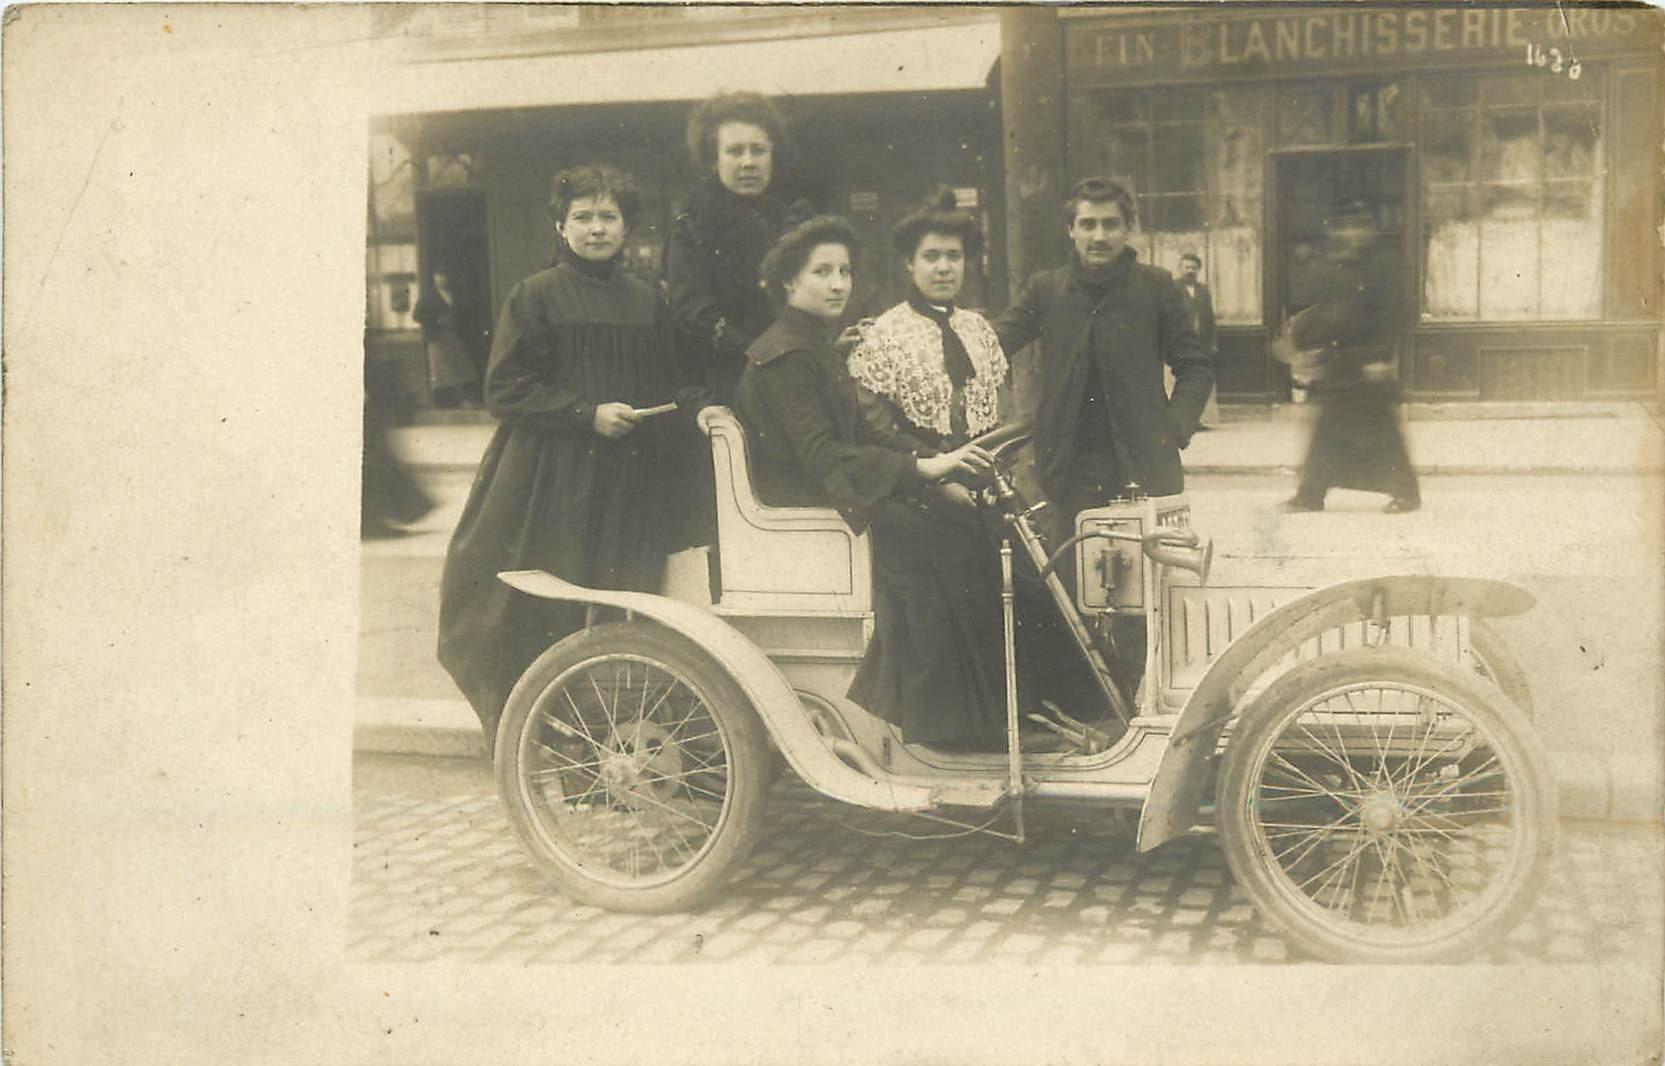 TRANSPORTS. Superbe voiture ancienne devant une Blanchisserie. Photo carte postale ancienne vers 1900